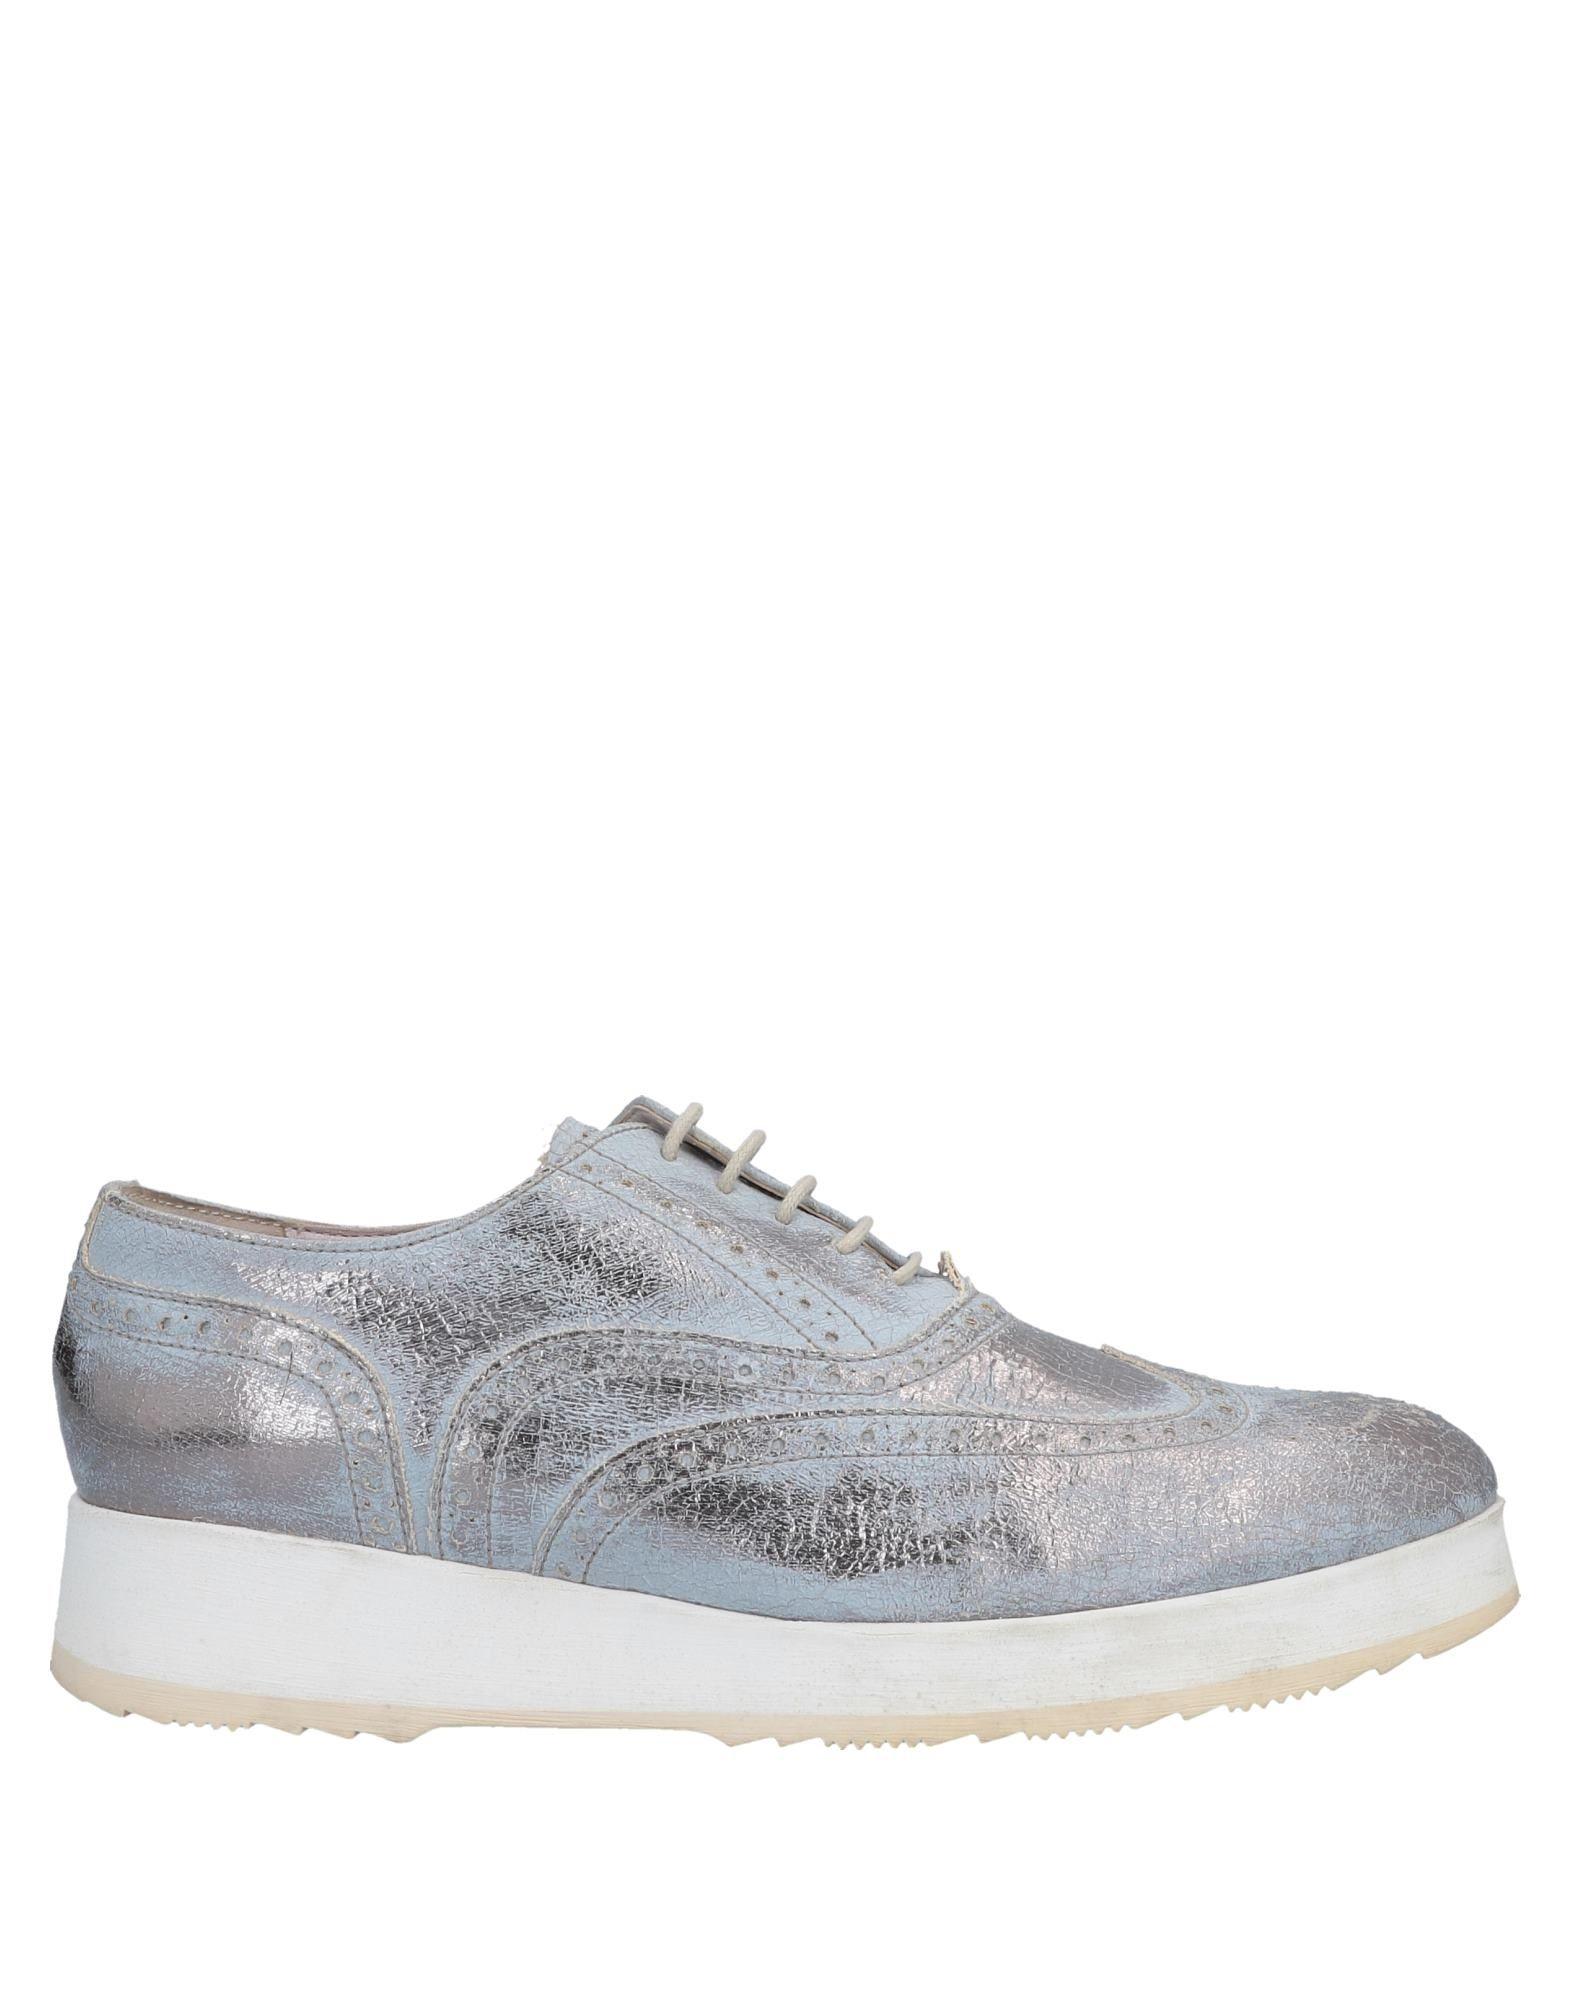 LORENZO MARI Обувь на шнурках су вид caso sv 300